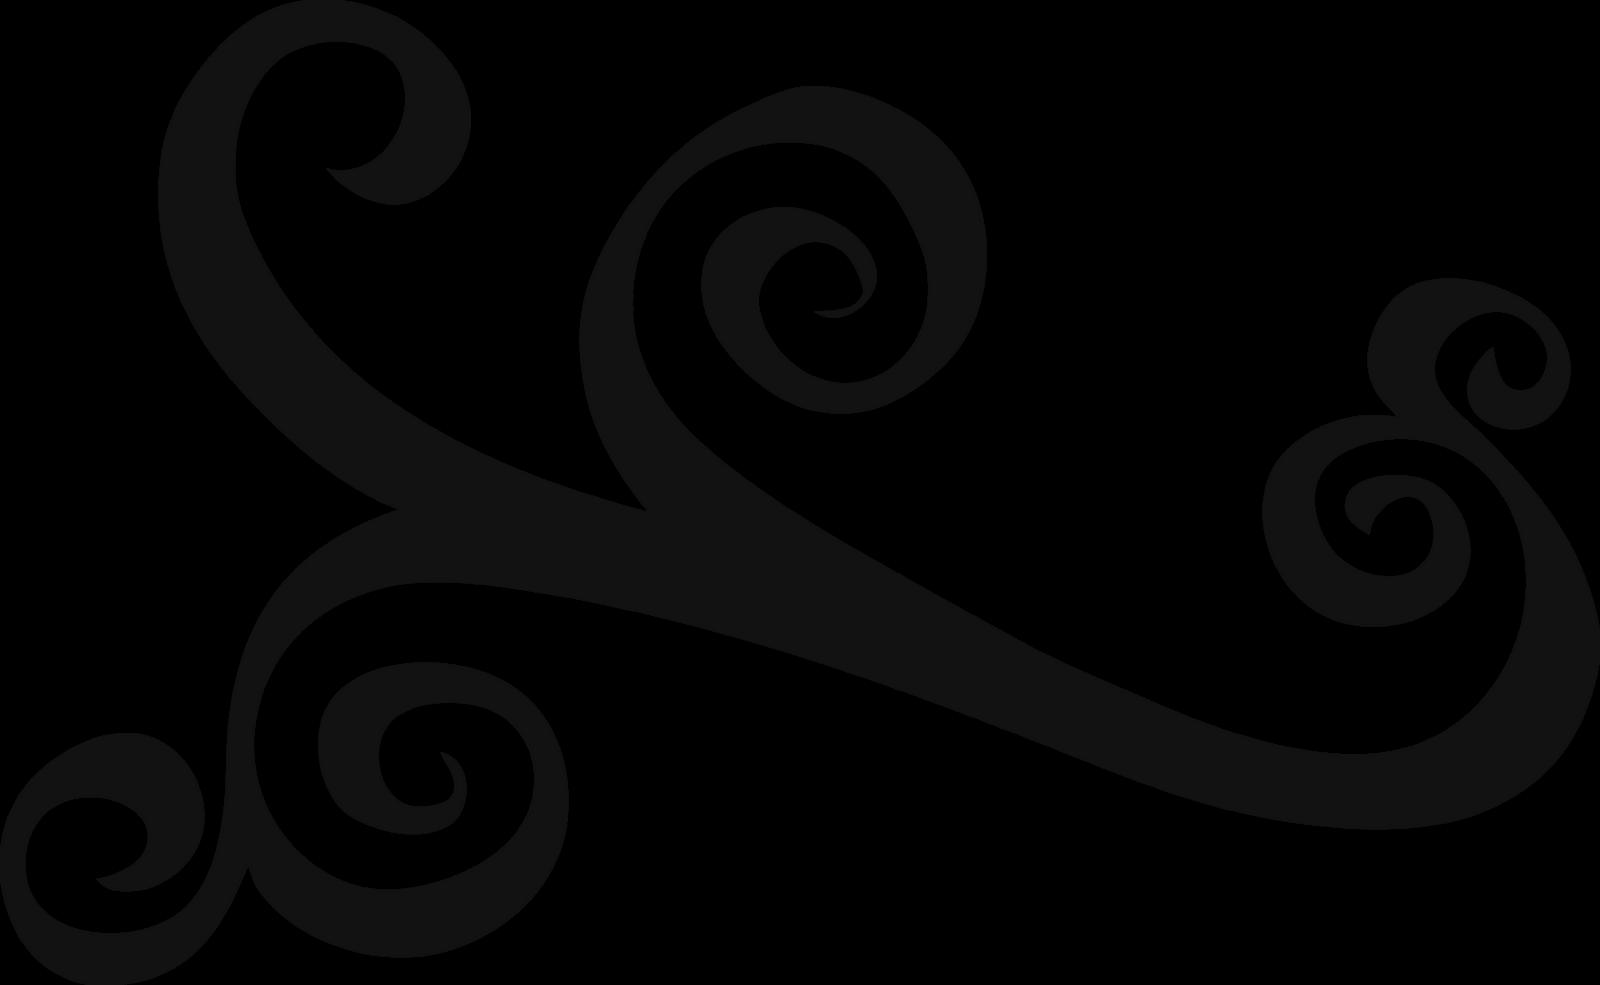 Swirl design clipart free download graphic royalty free Free Accent Cliparts, Download Free Clip Art, Free Clip Art on ... graphic royalty free